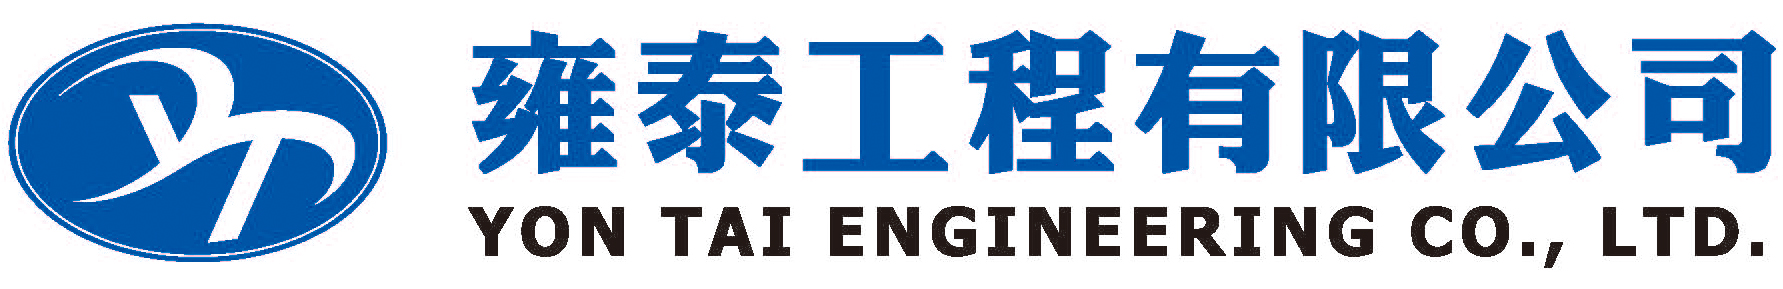 RWD_雍泰工程有限公司